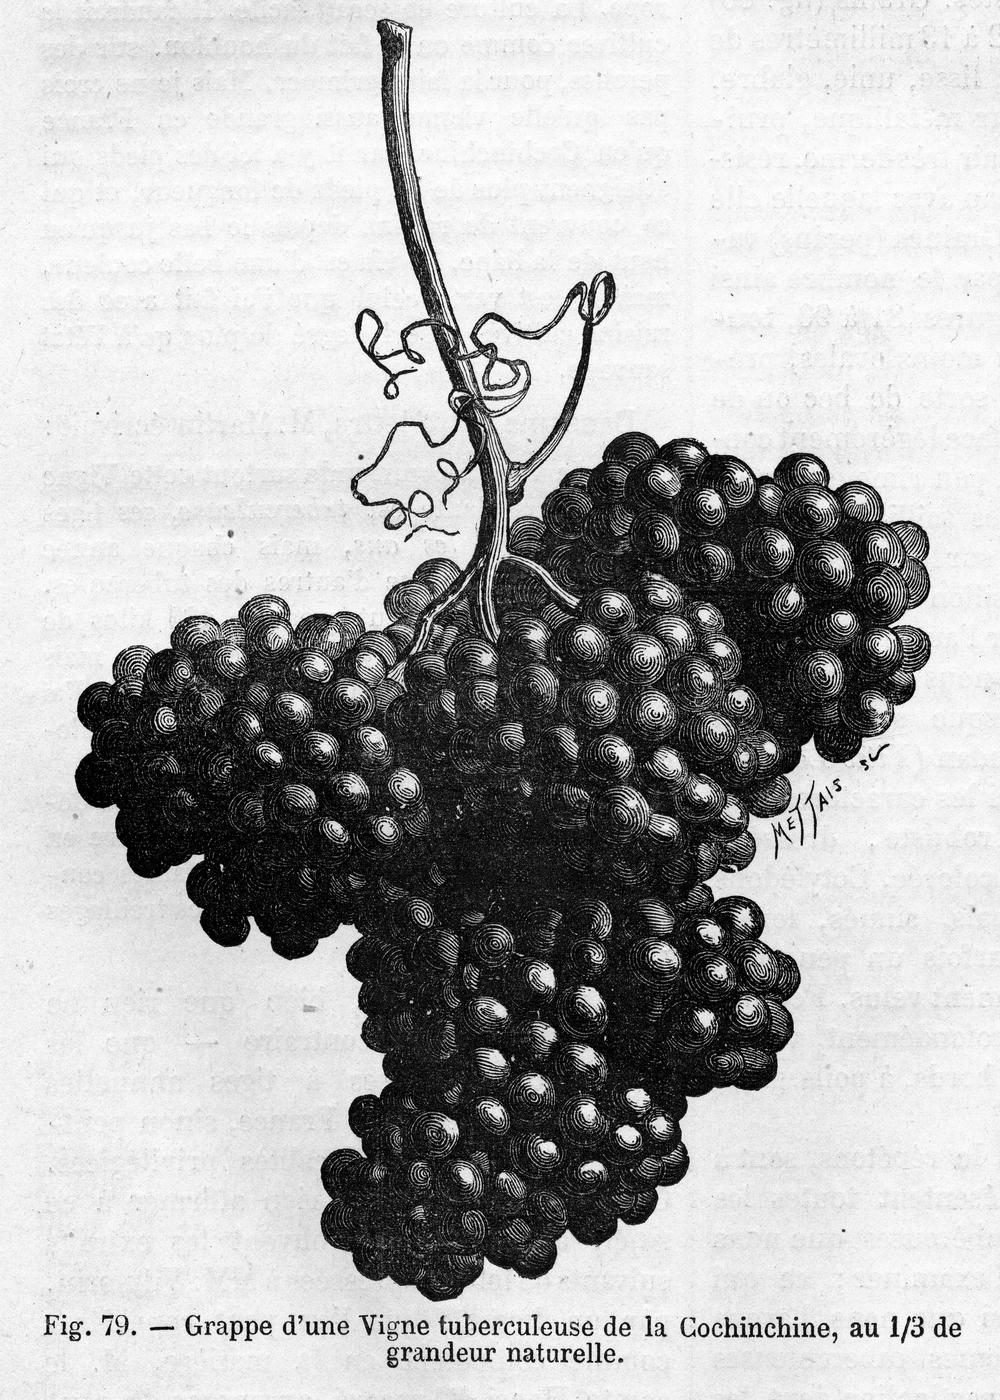 RH 1883 Vigne tuberculeuse de Cochinchine